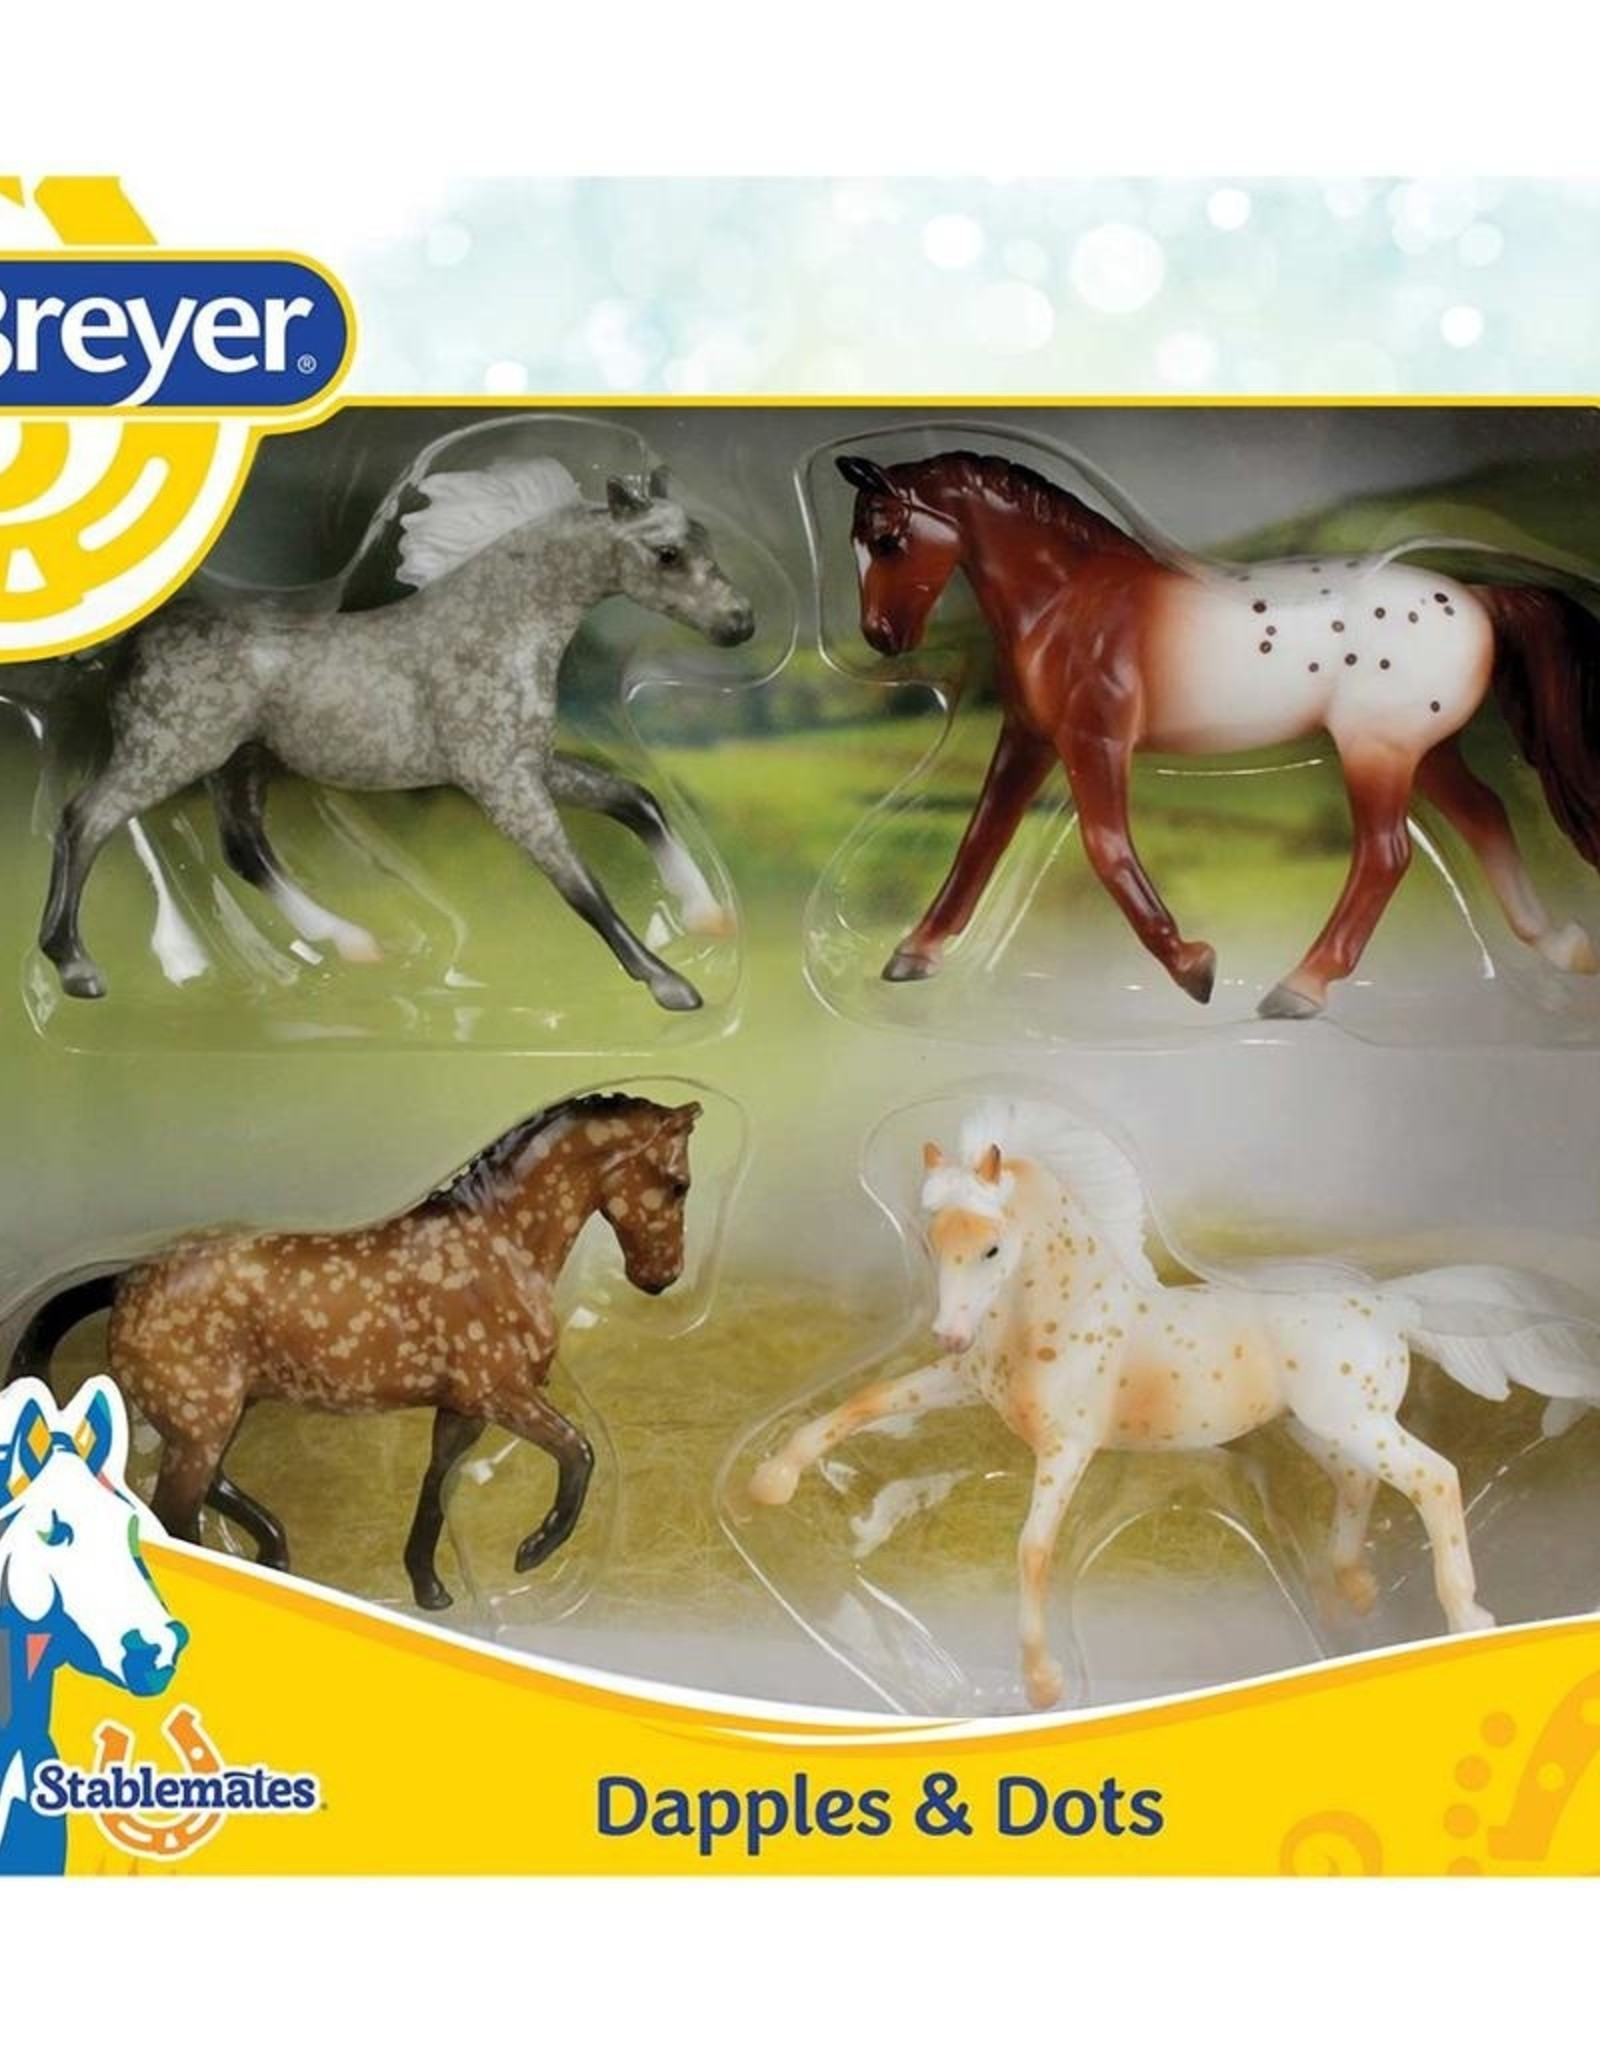 Breyer Dapples & Dots 4-Horse Set